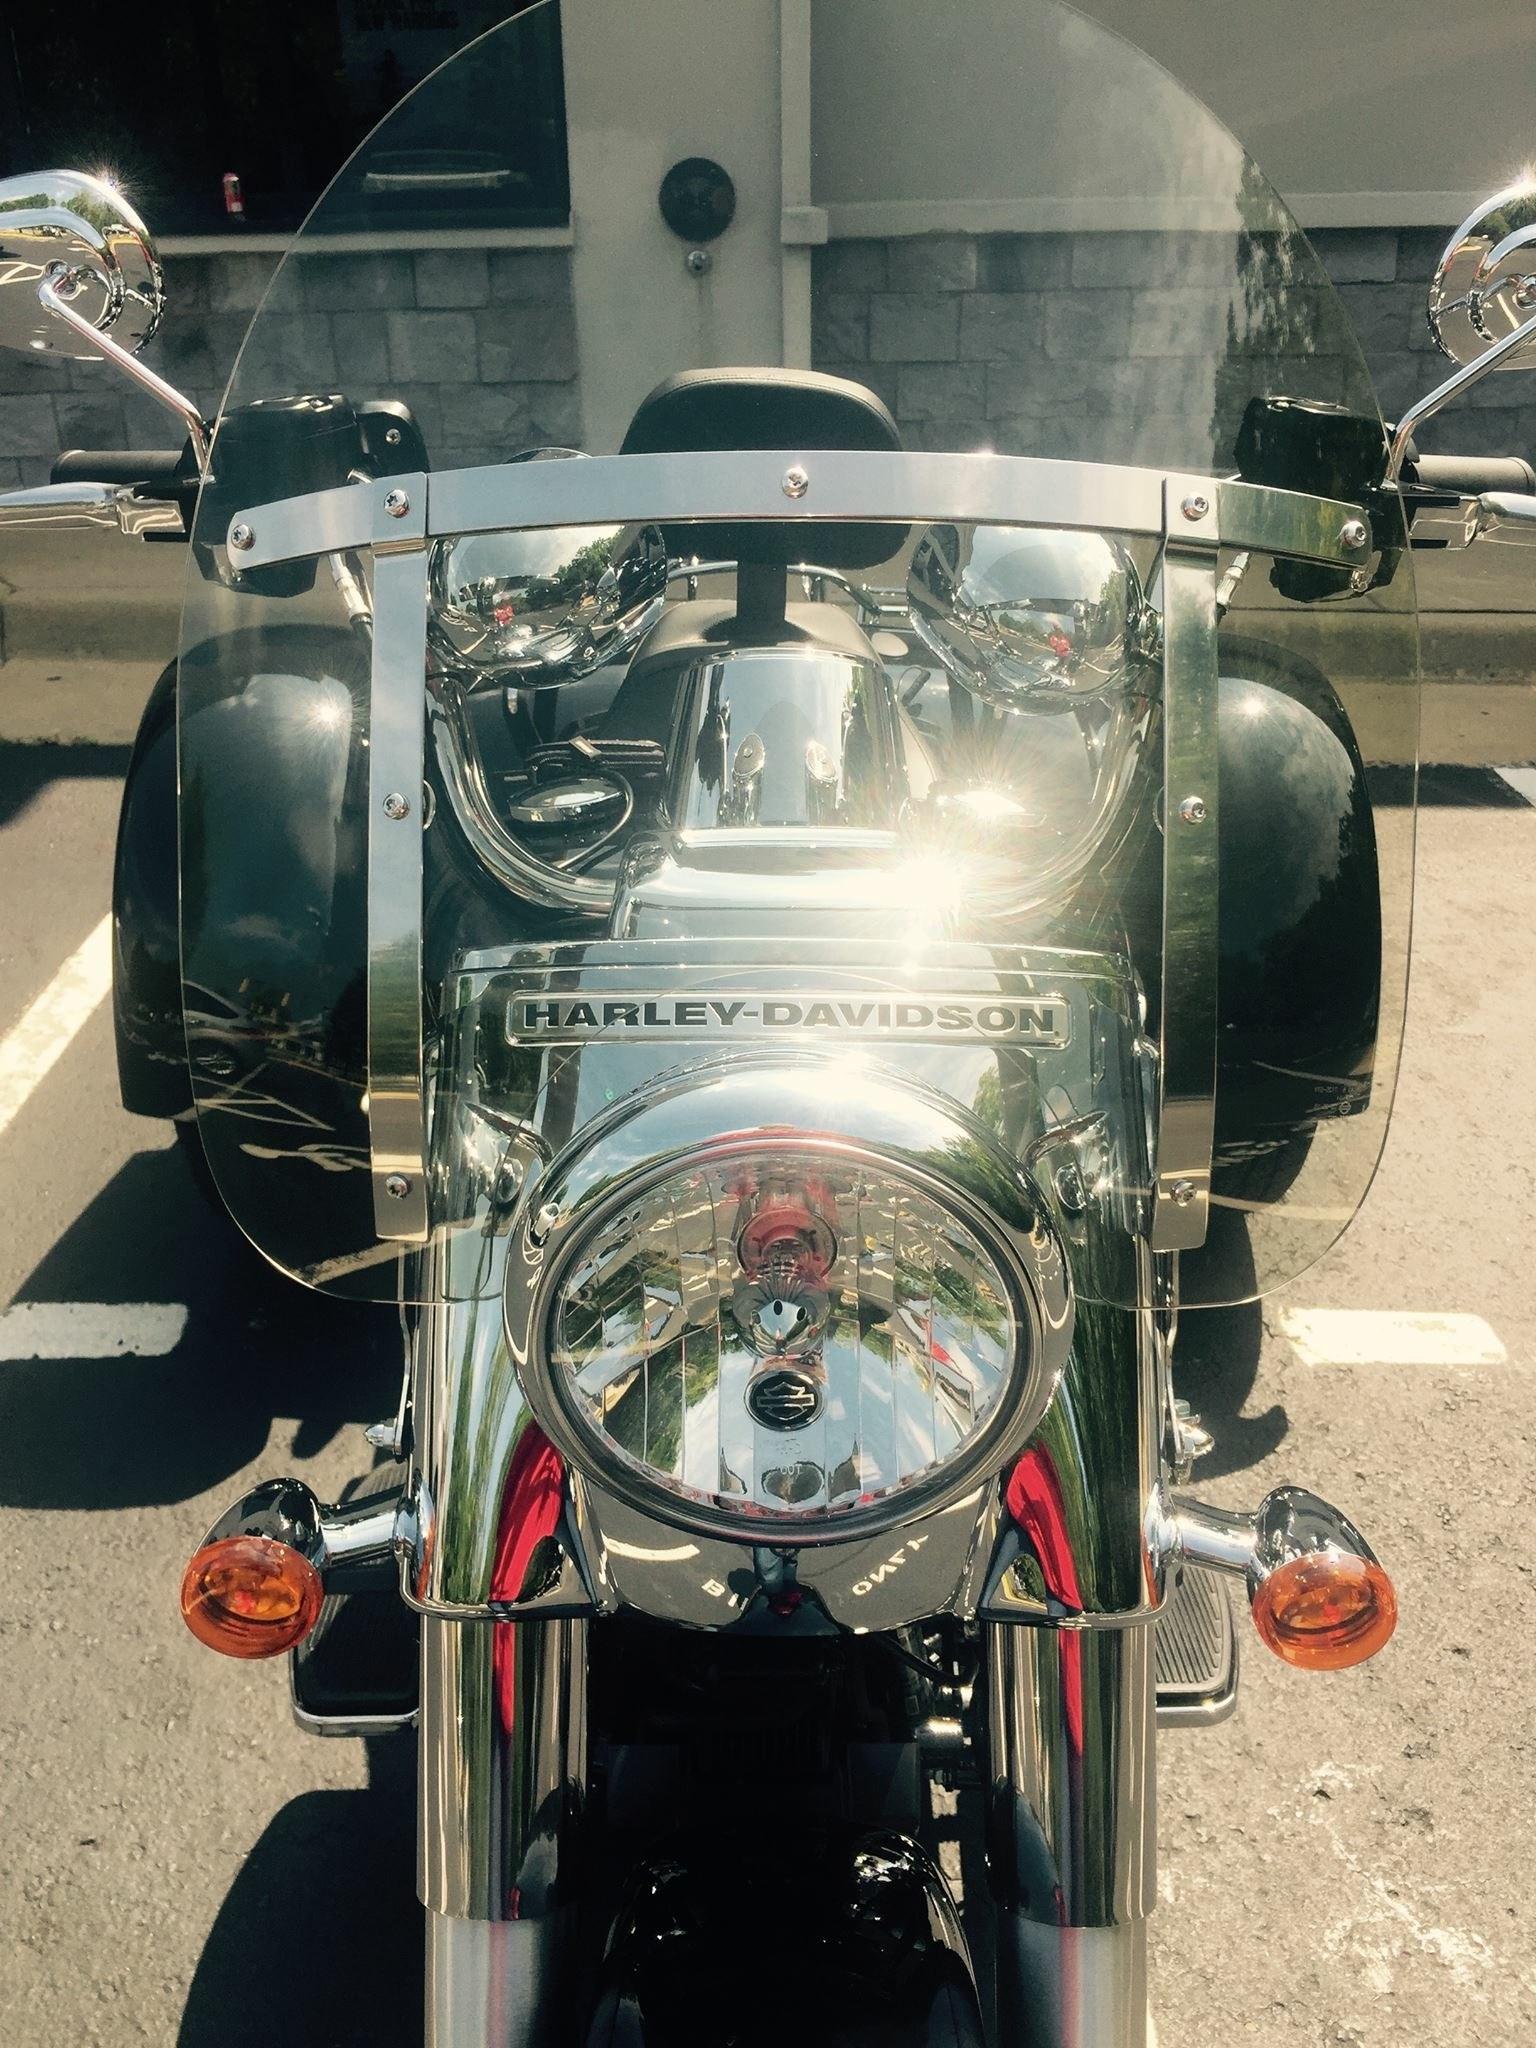 Apple Valley Harley Davidson Trikes For Sale